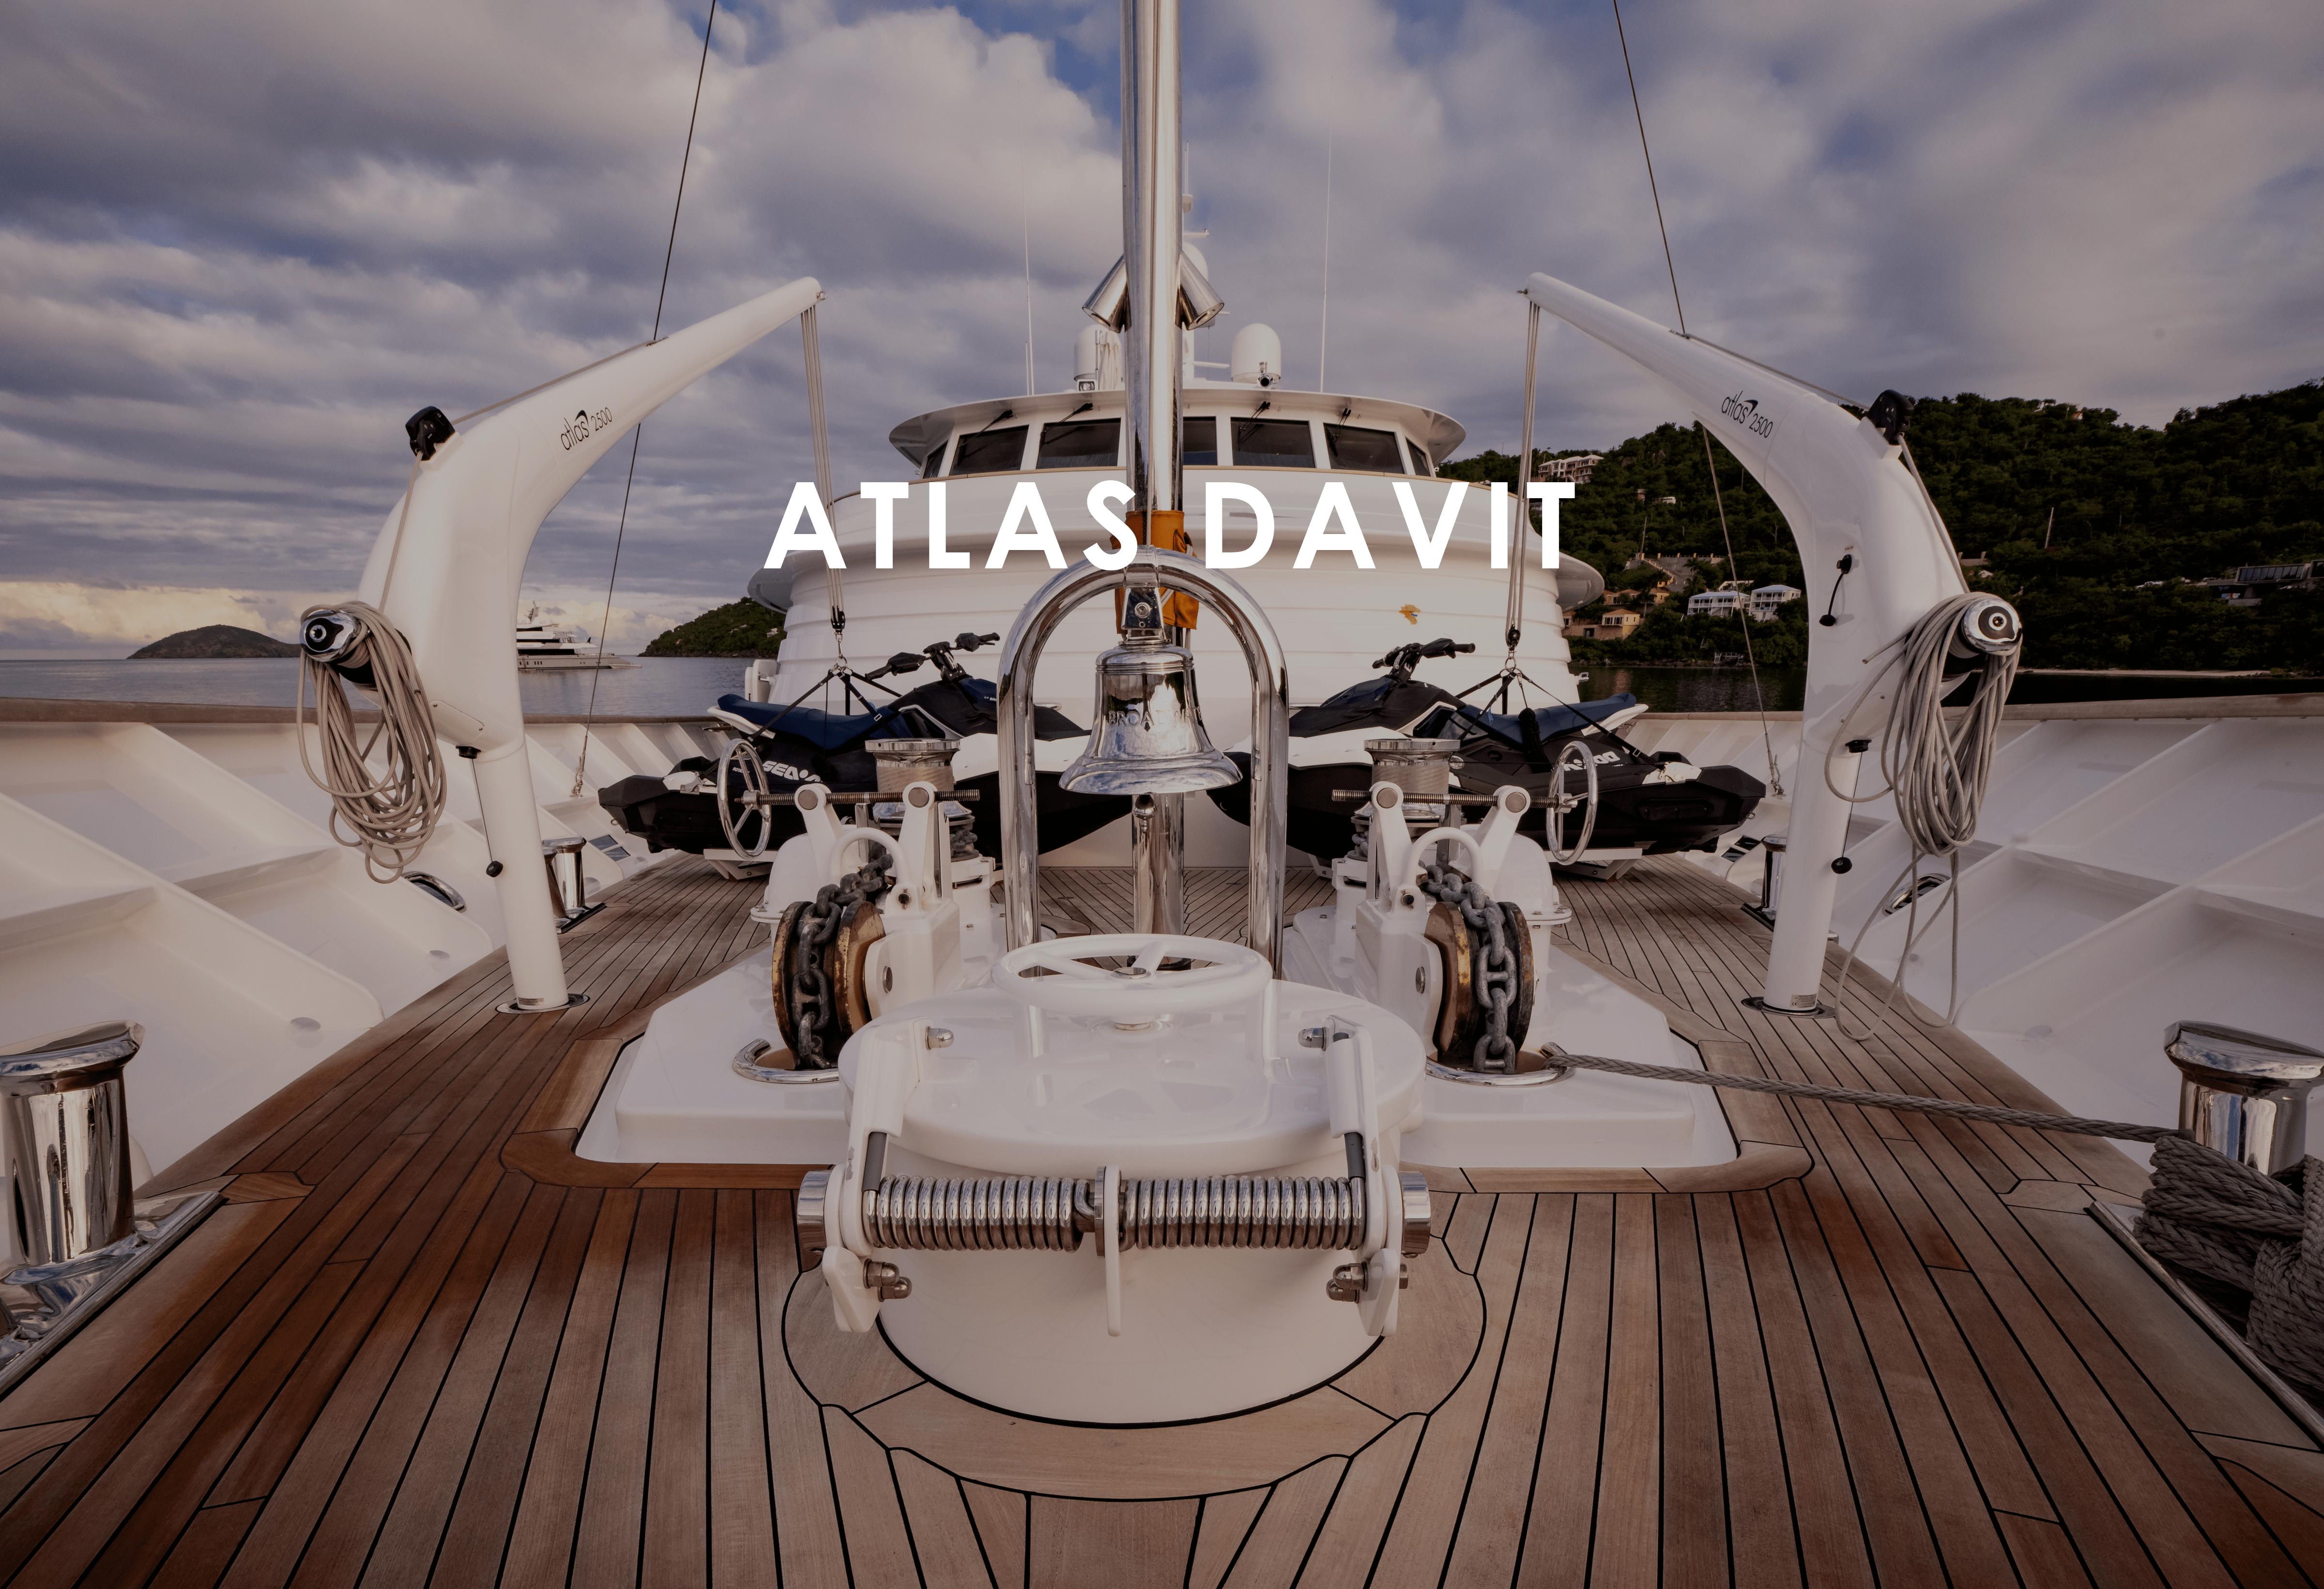 Atlas Davit Systems